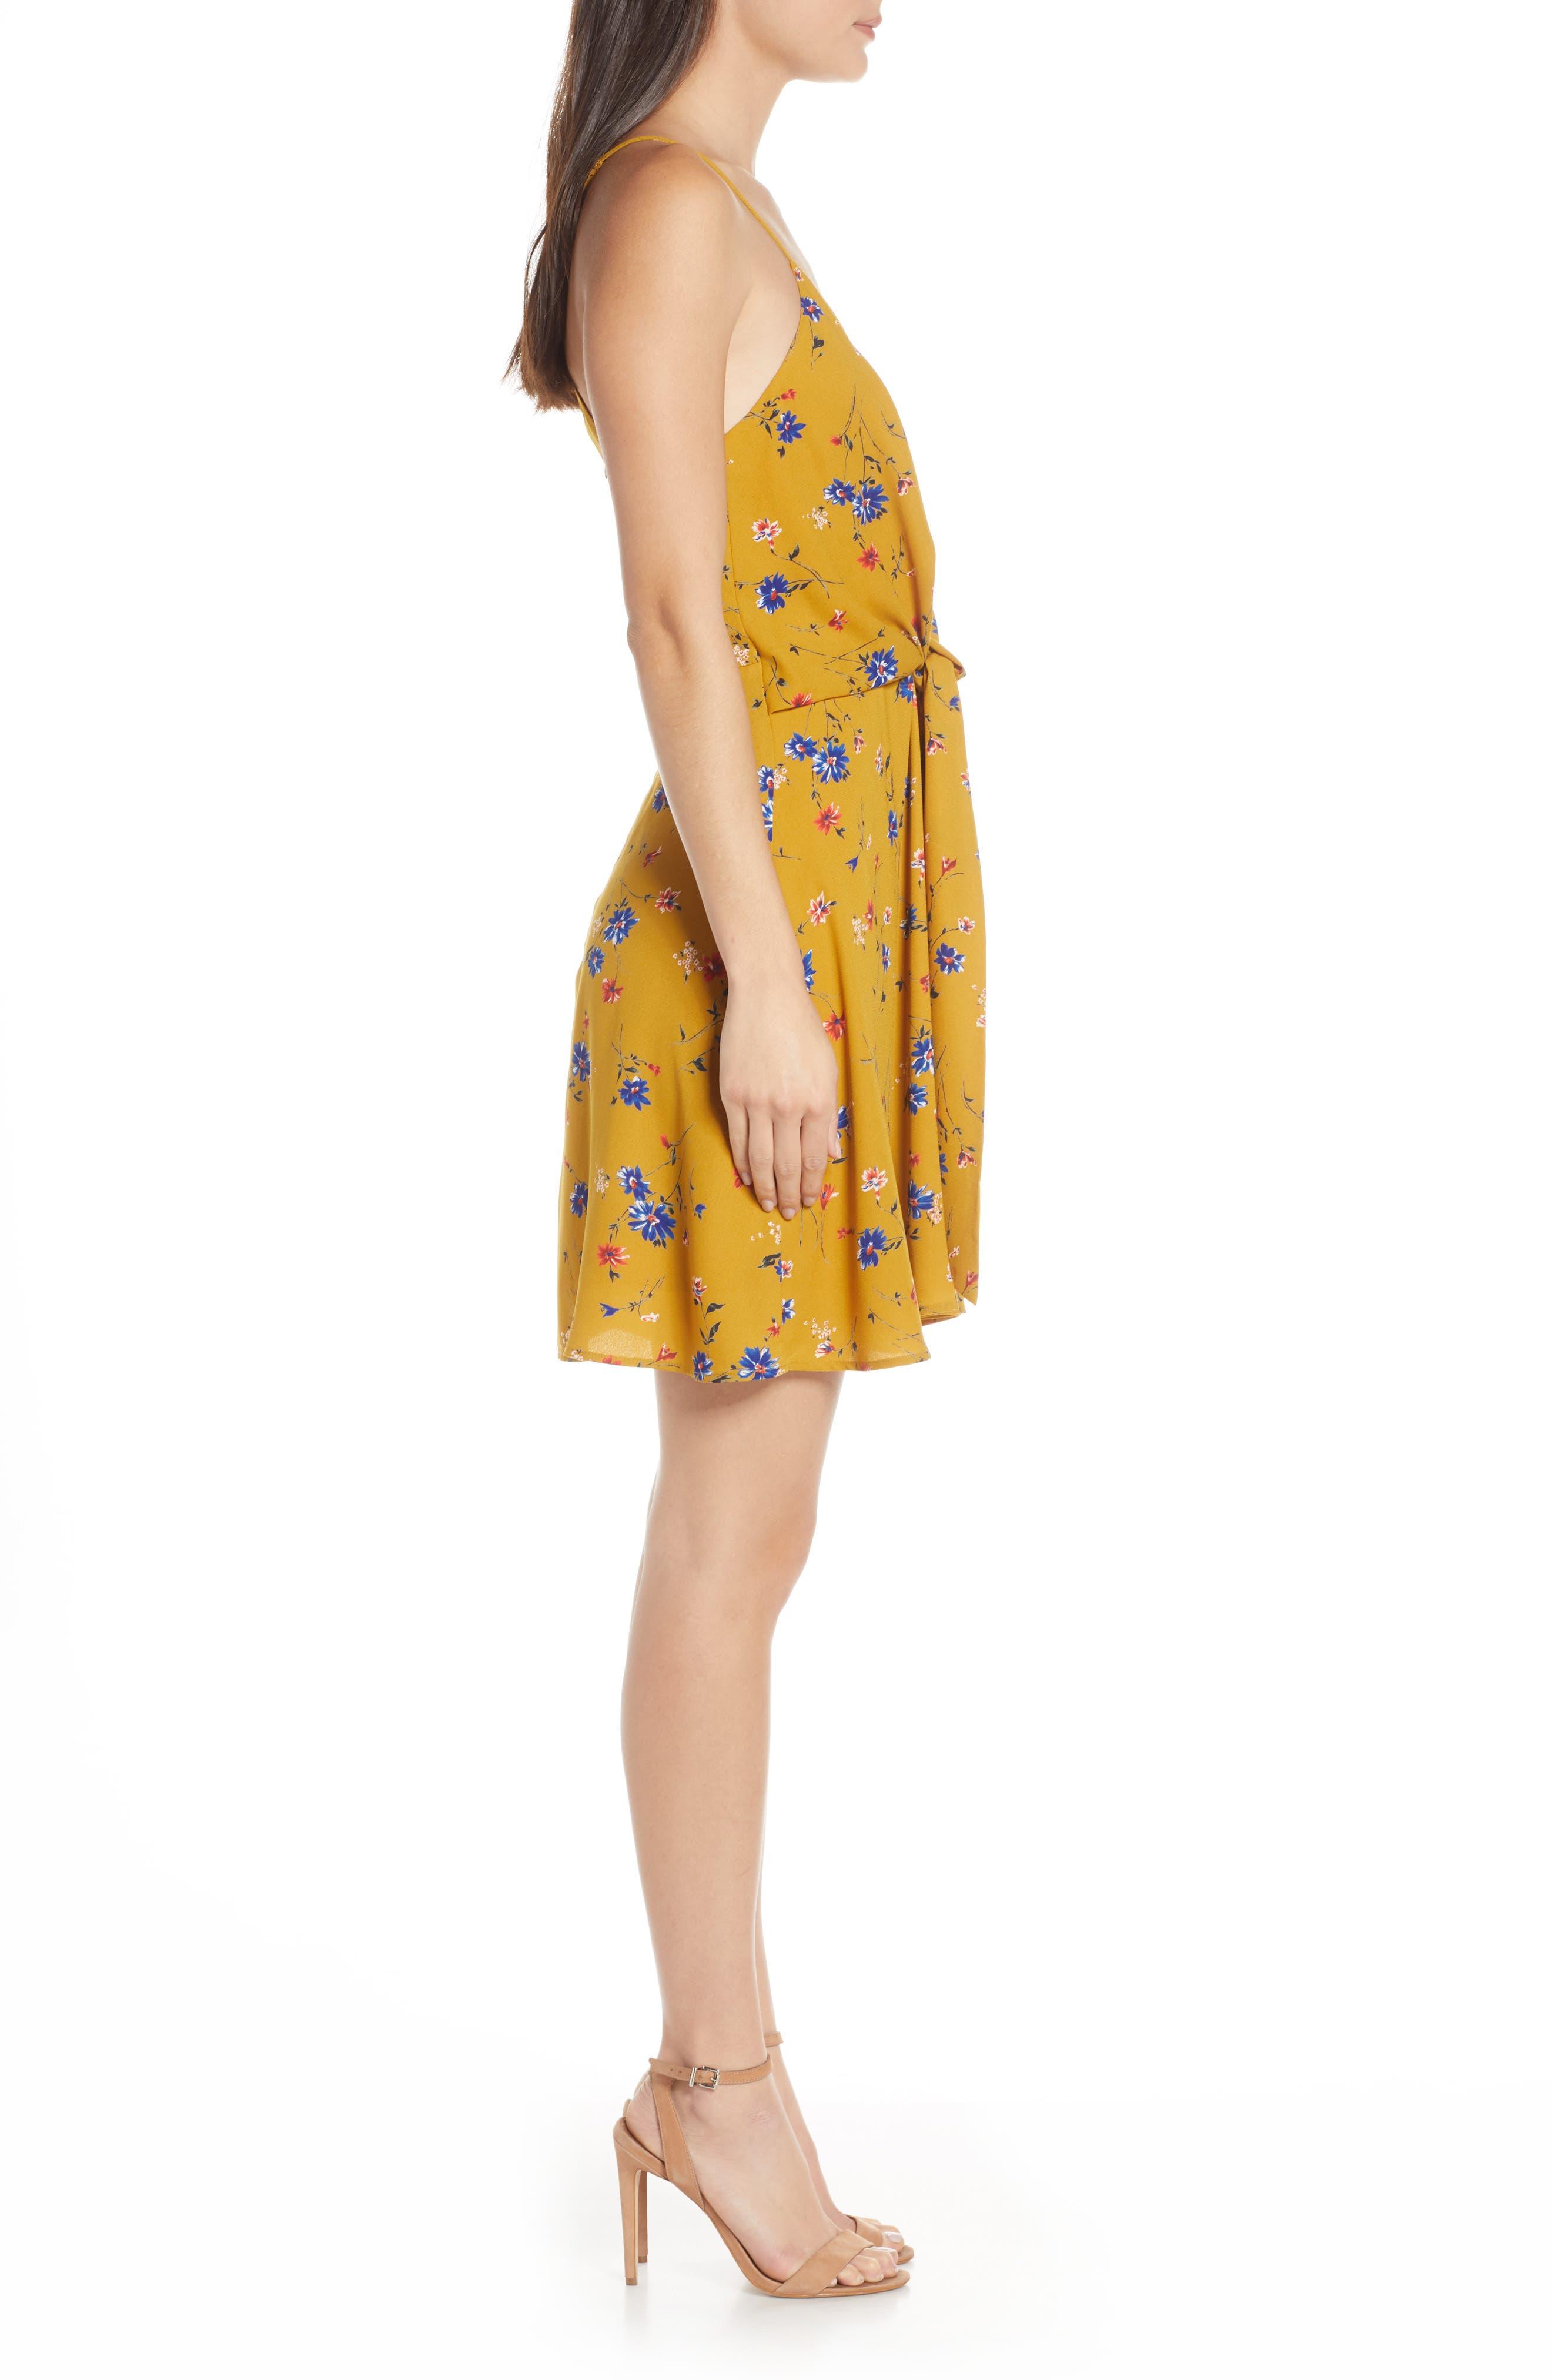 19 COOPER, Floral Print Tie Front Dress, Alternate thumbnail 4, color, MUSTARD FLORAL